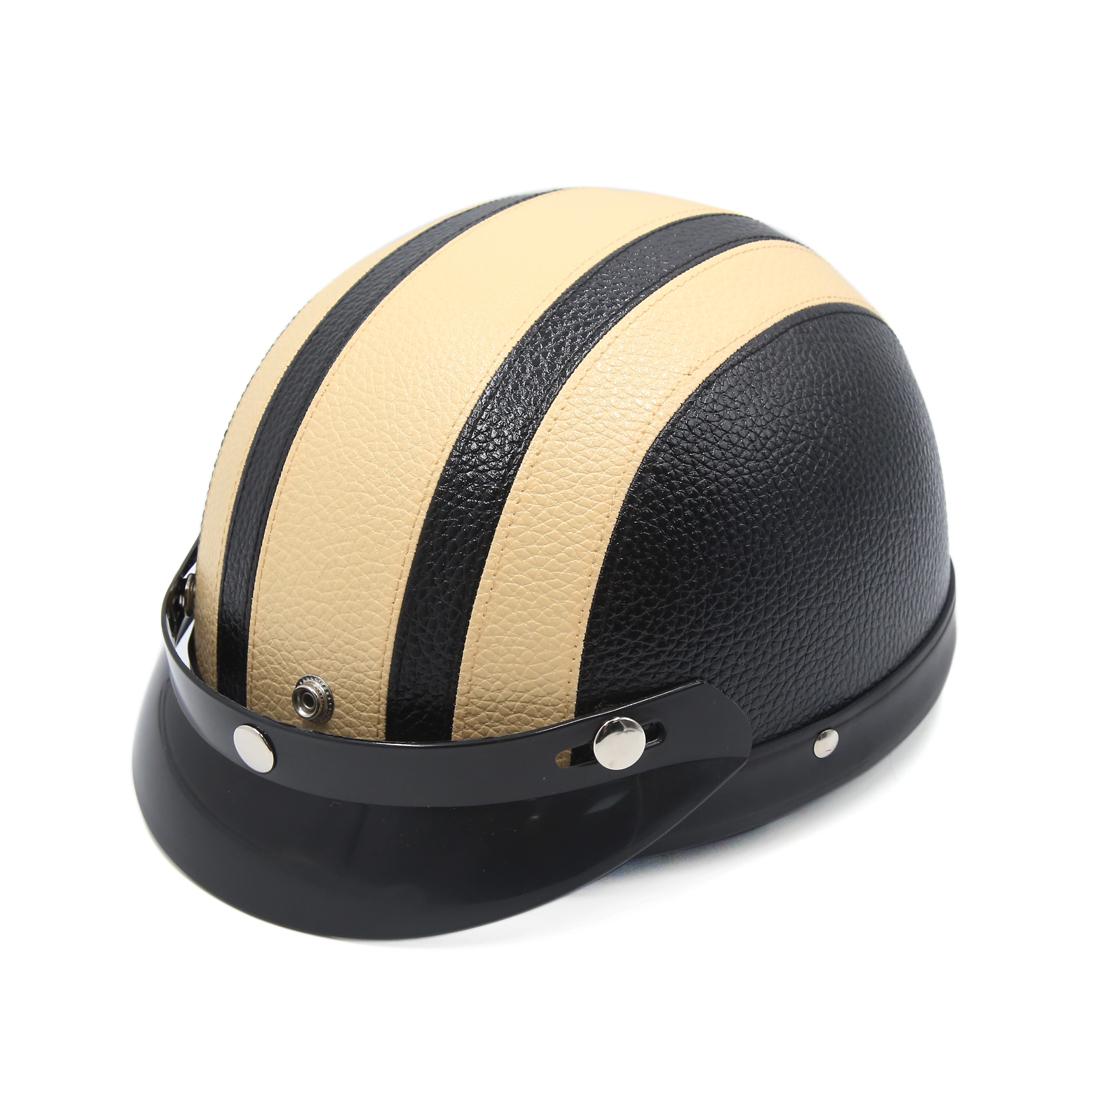 Black Beige Faux Leather Coated Motorcycle Adjustable Nylon Strap Half Helmet